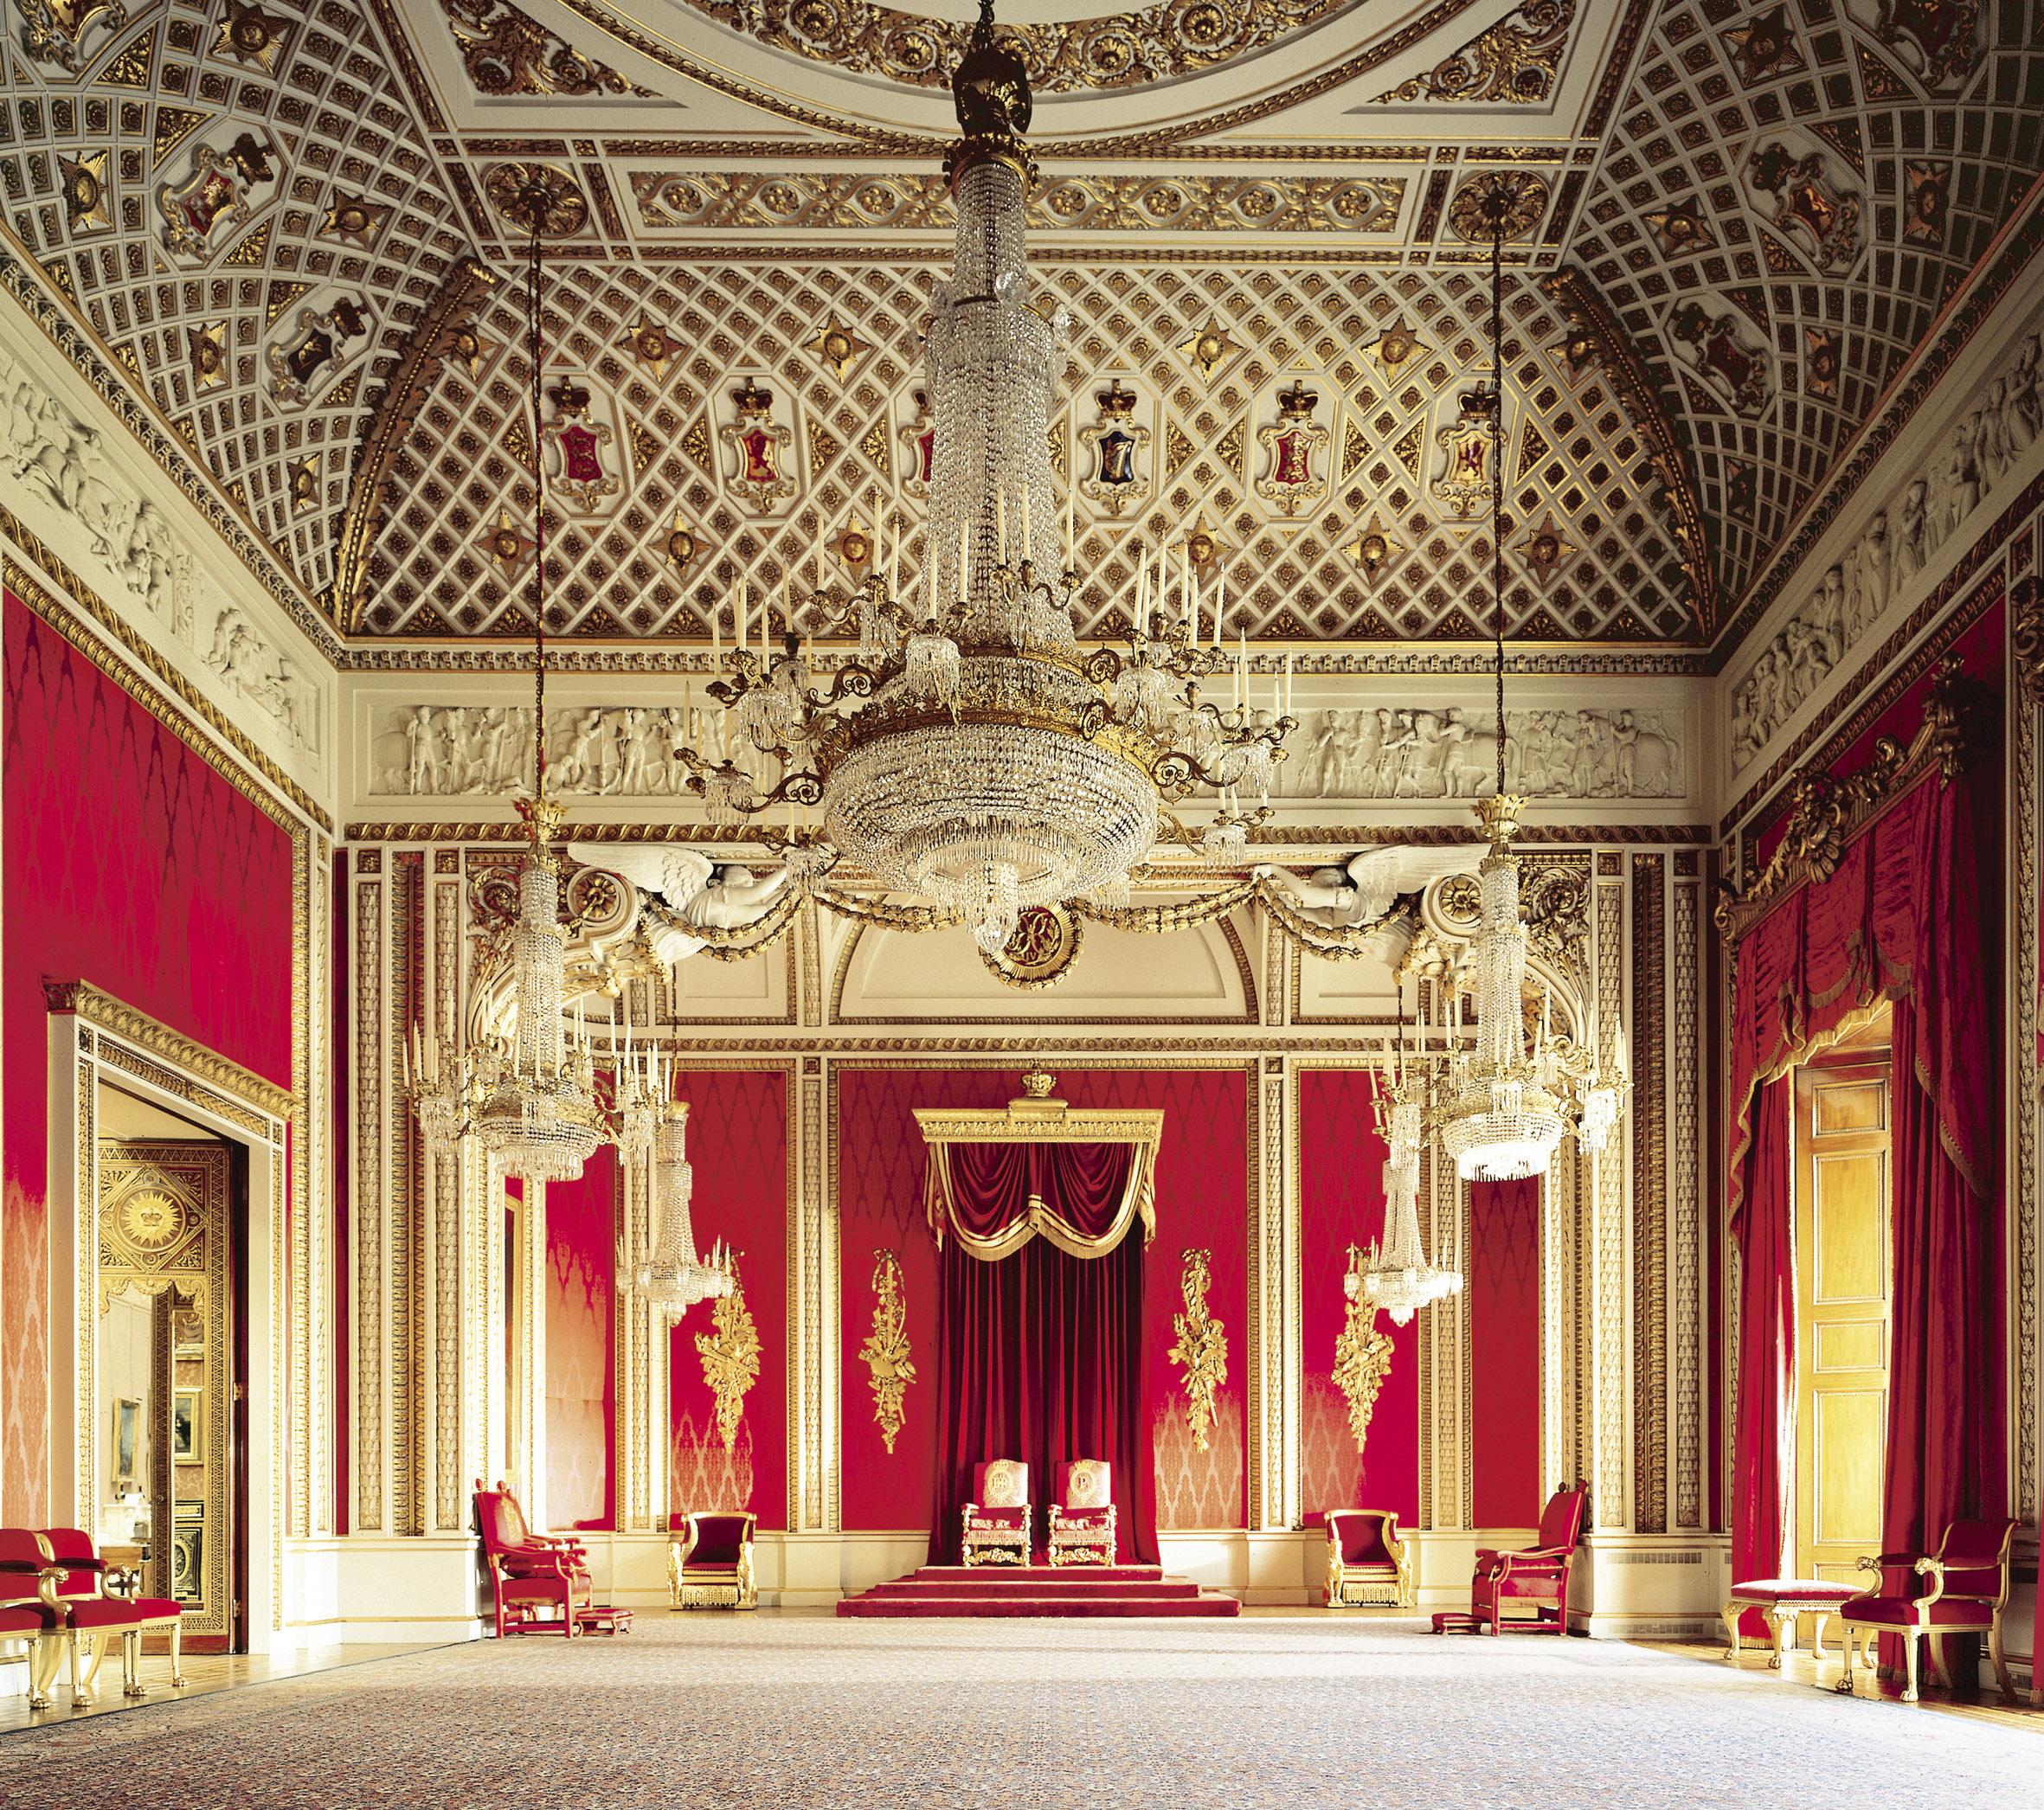 Royal room photo